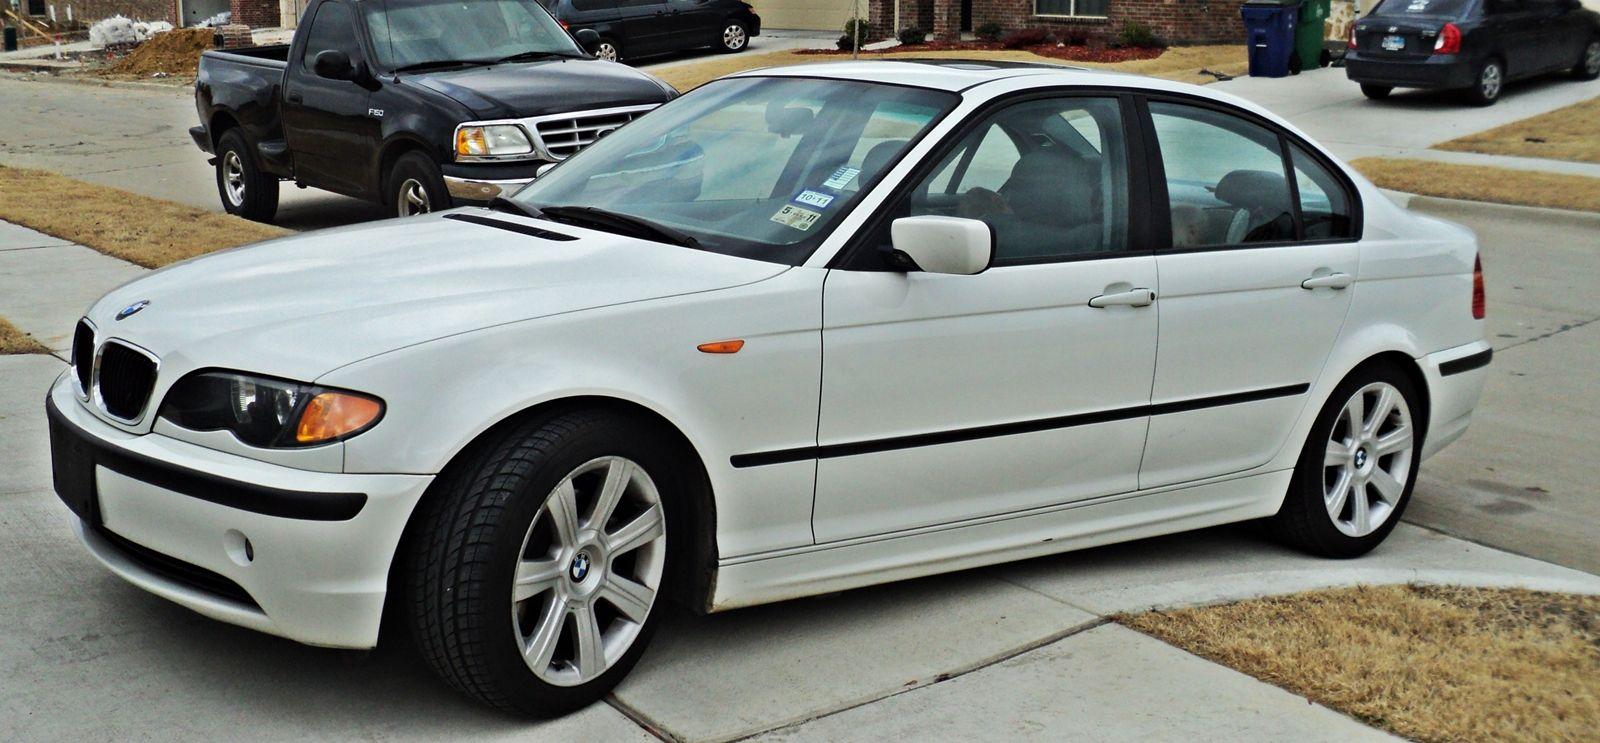 Beautiful BMW 325i Luxury Cars at Canada Dream cars